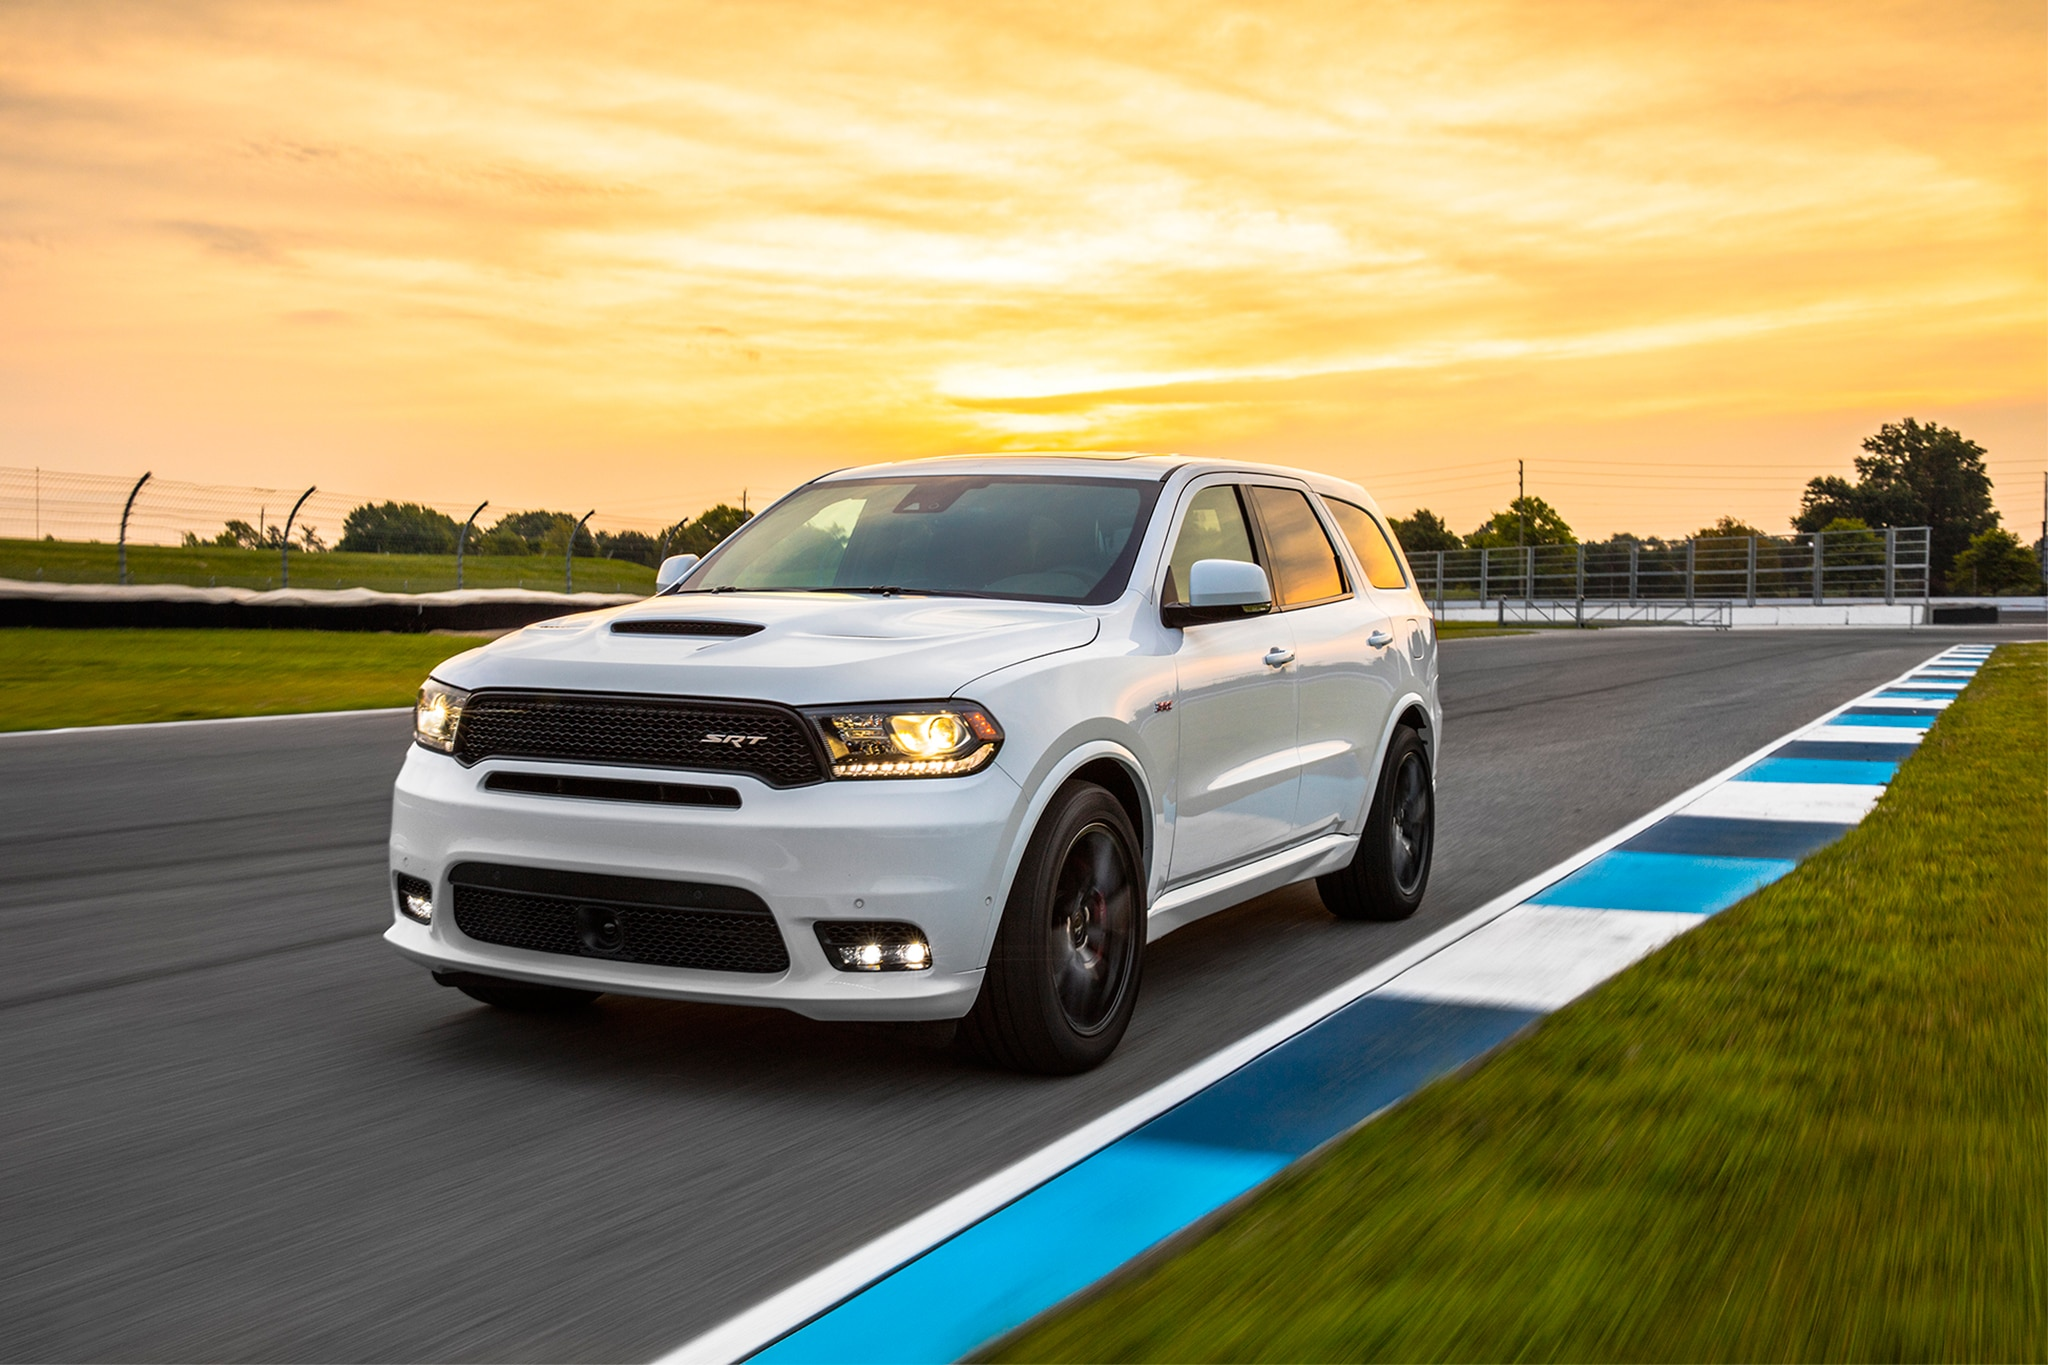 2018 Dodge Durango SRT Front Three Quarter In Motion 04 1